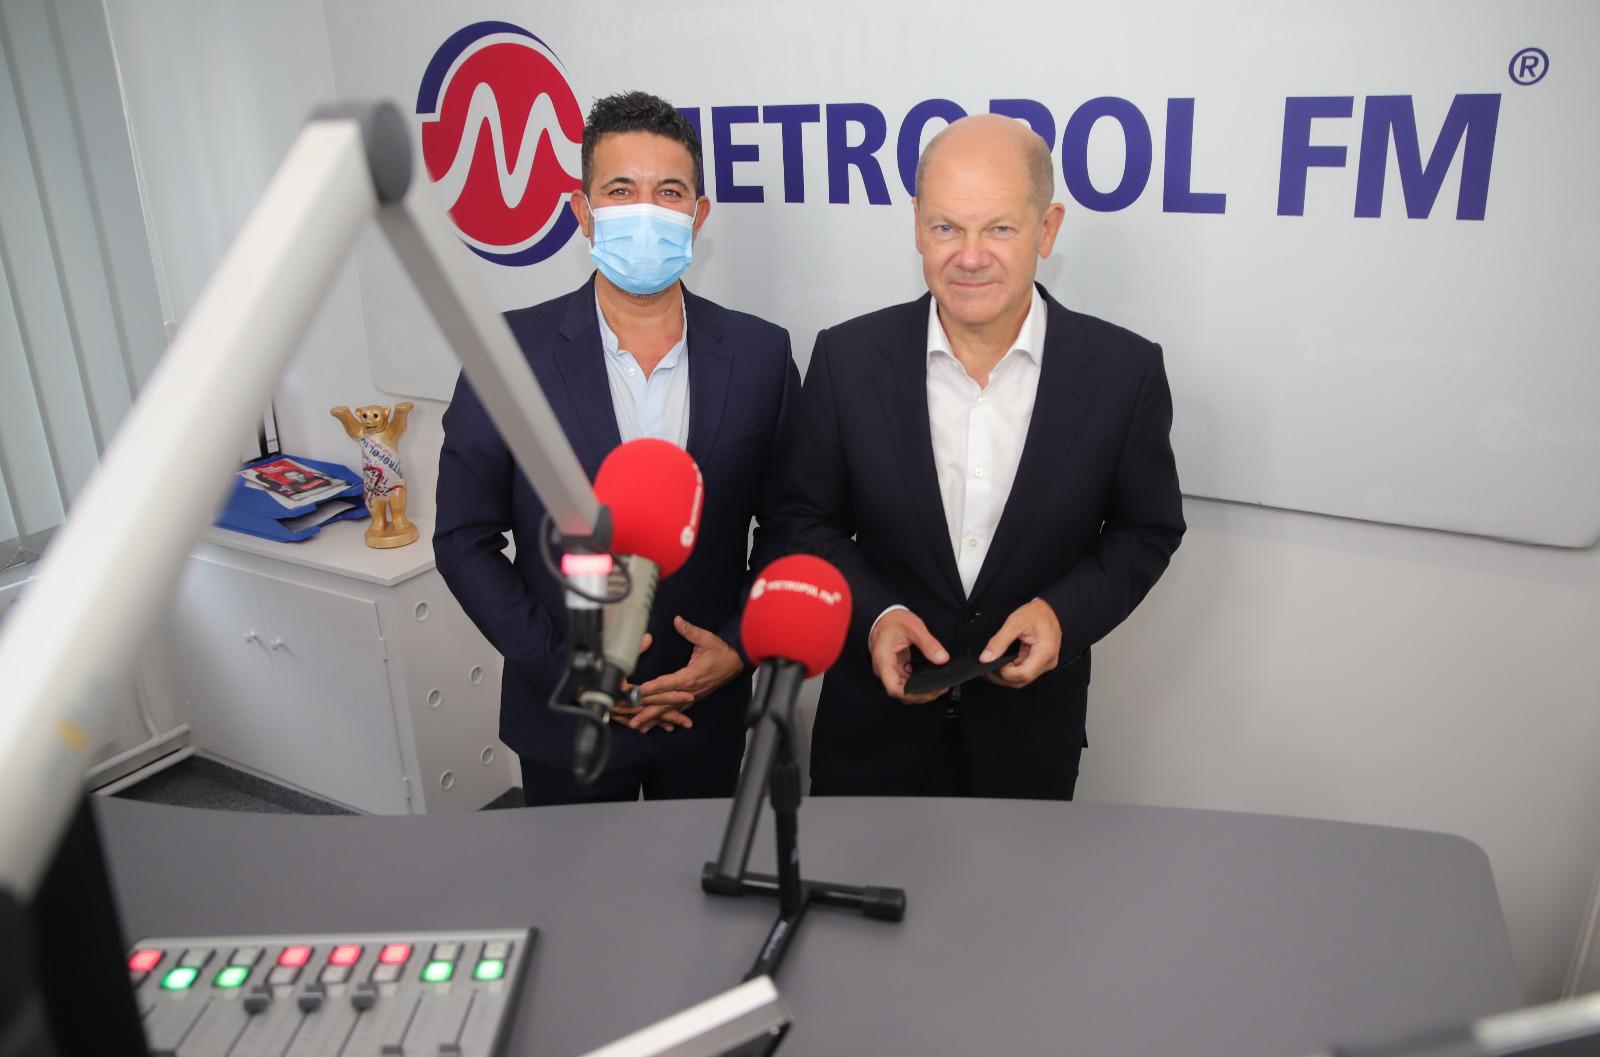 SPD'nin Başbakan Adayı Olaf Scholz Metropol FM'i Ziyaret Etti